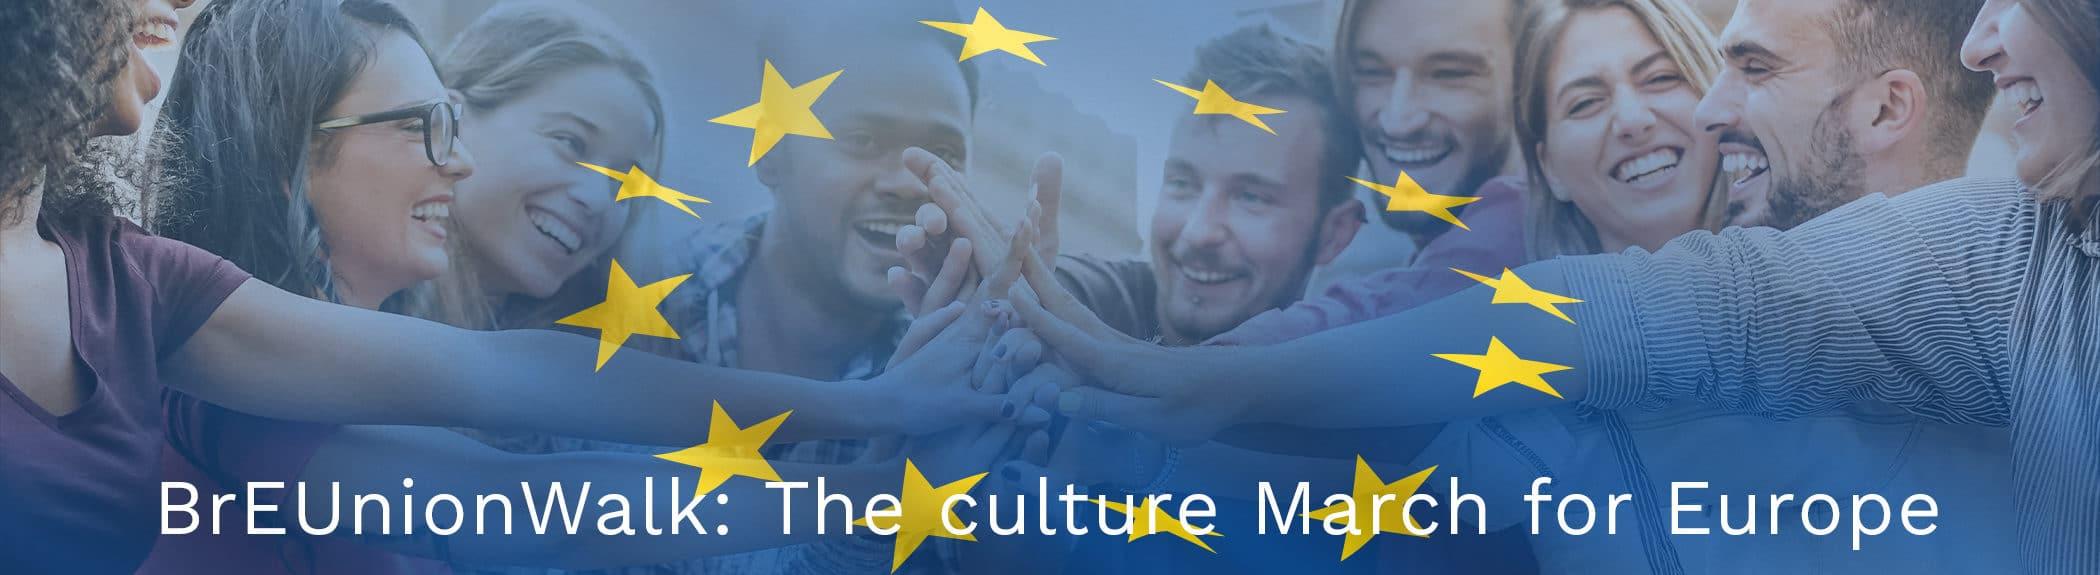 BrEUnionWalk: The culture March for Europe